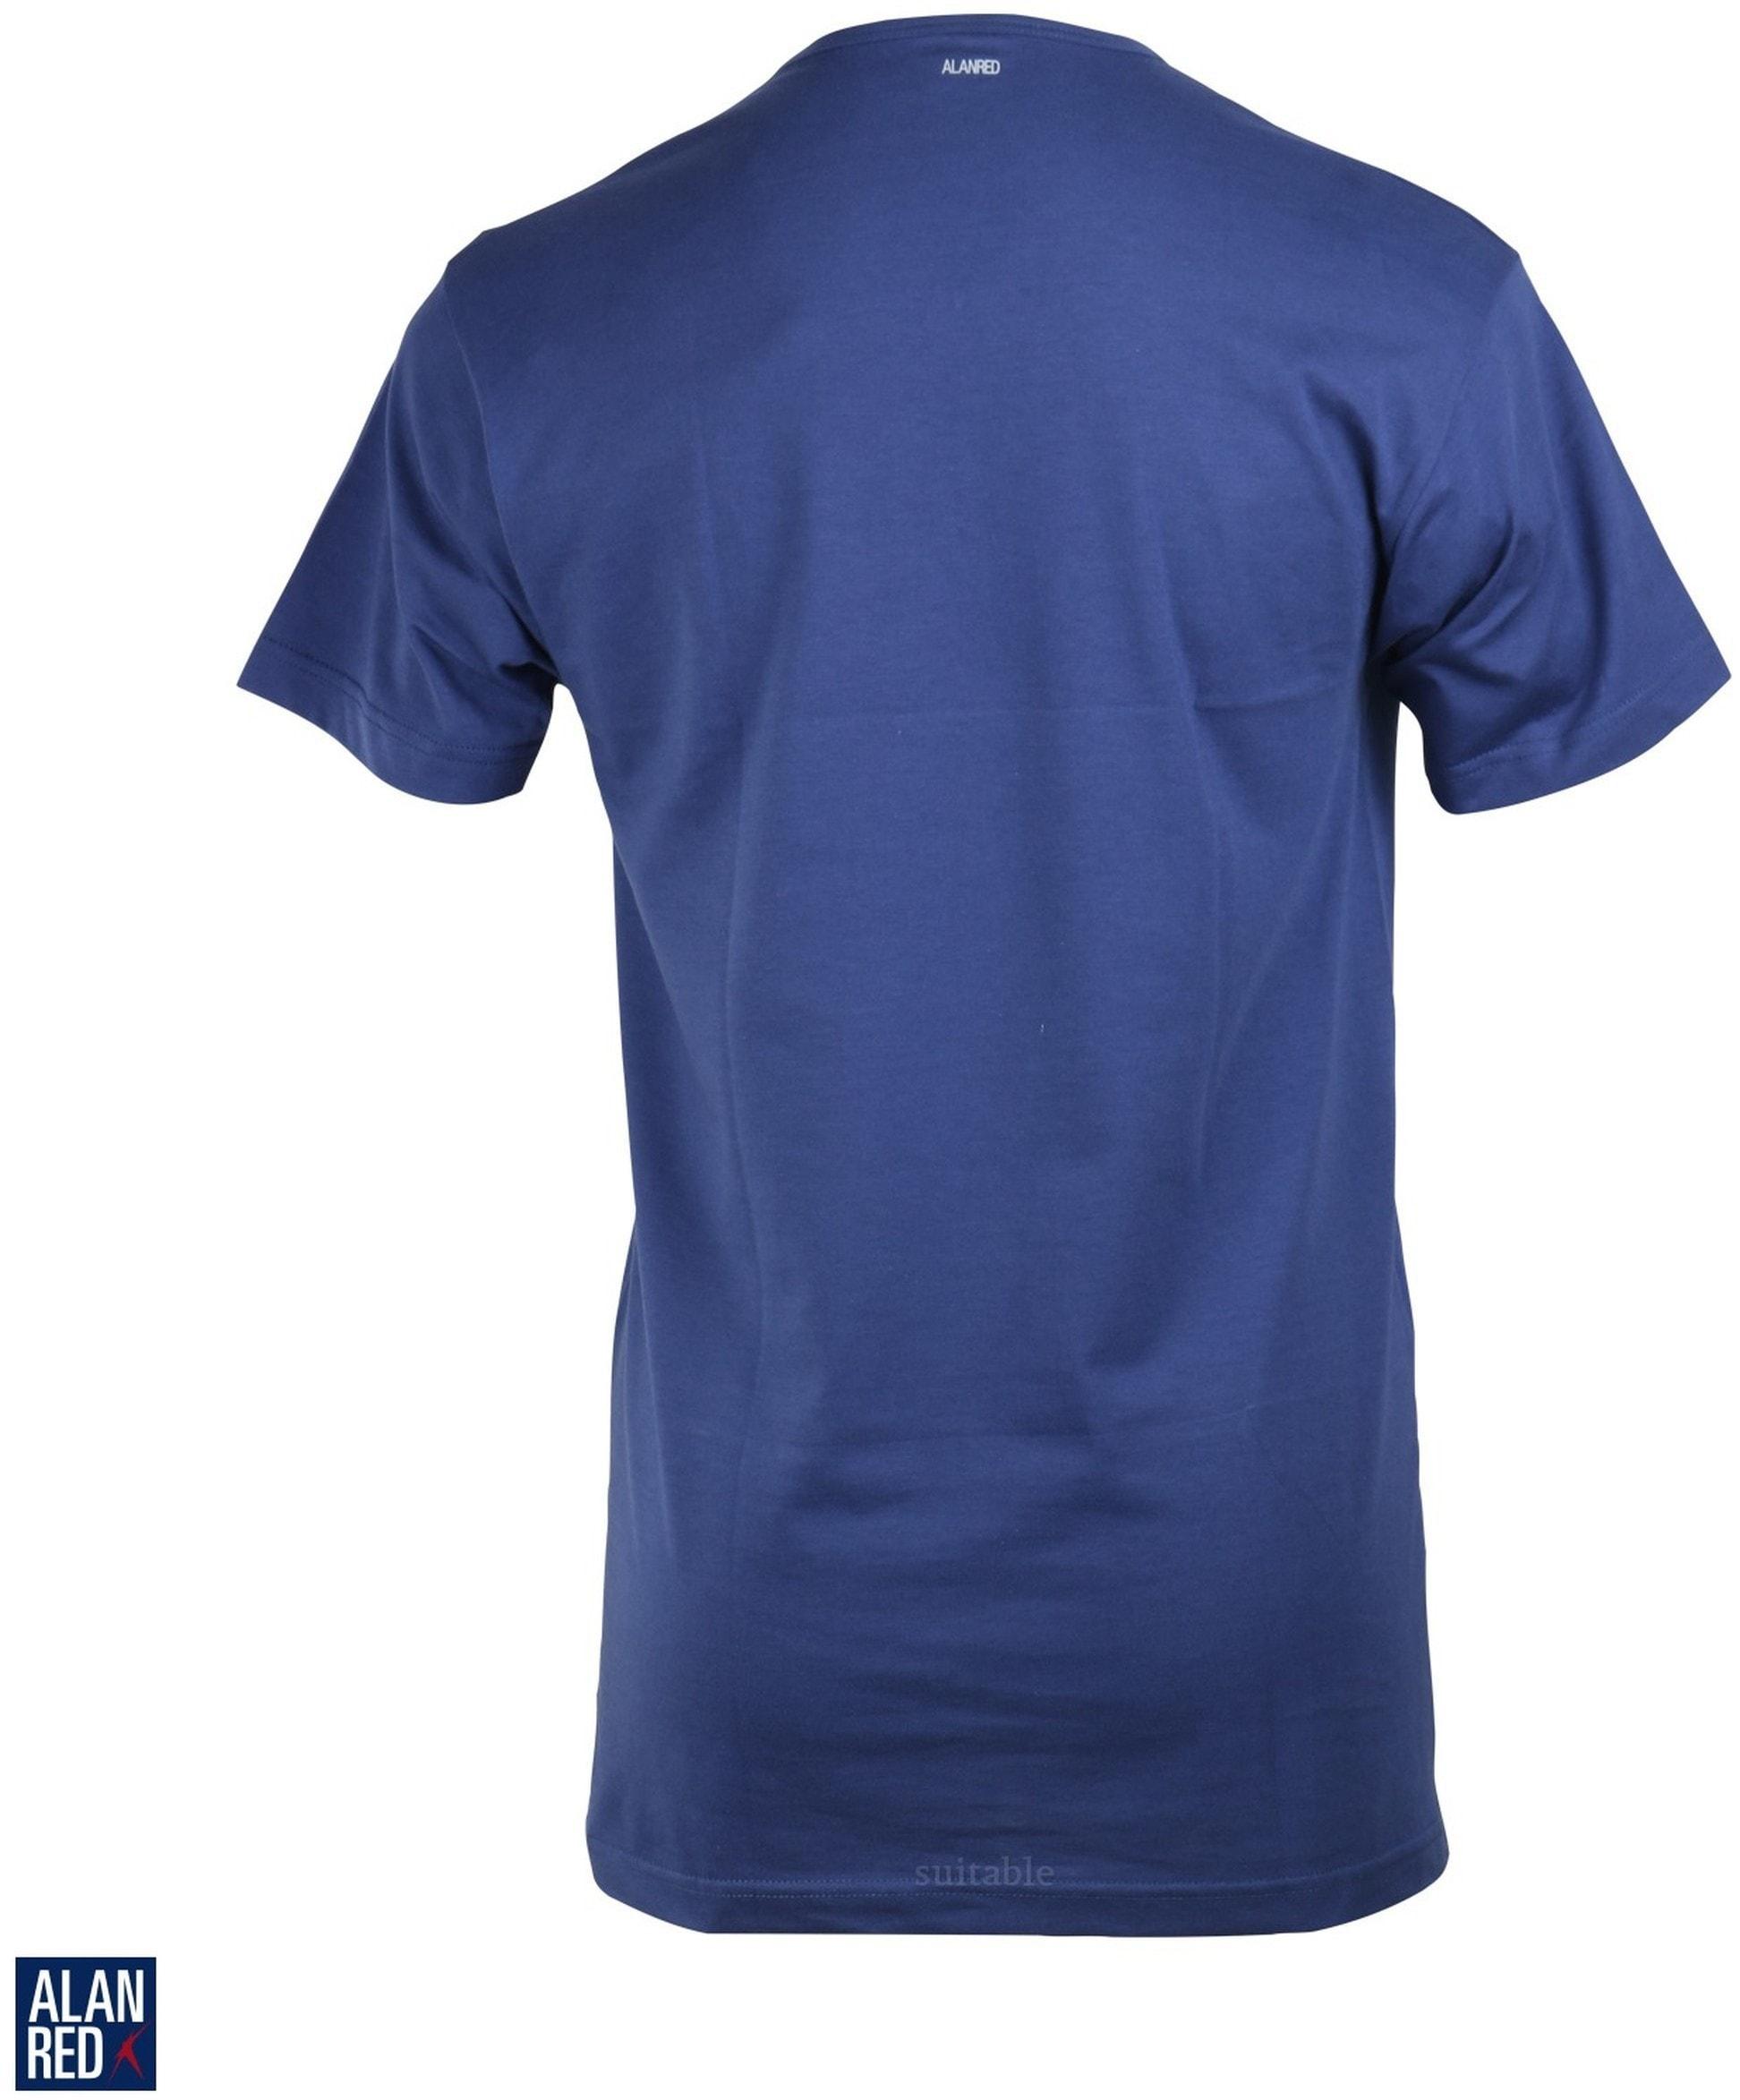 Alan Red Vermont T-shirt V-Neck Ultramarine 1-Pack foto 2